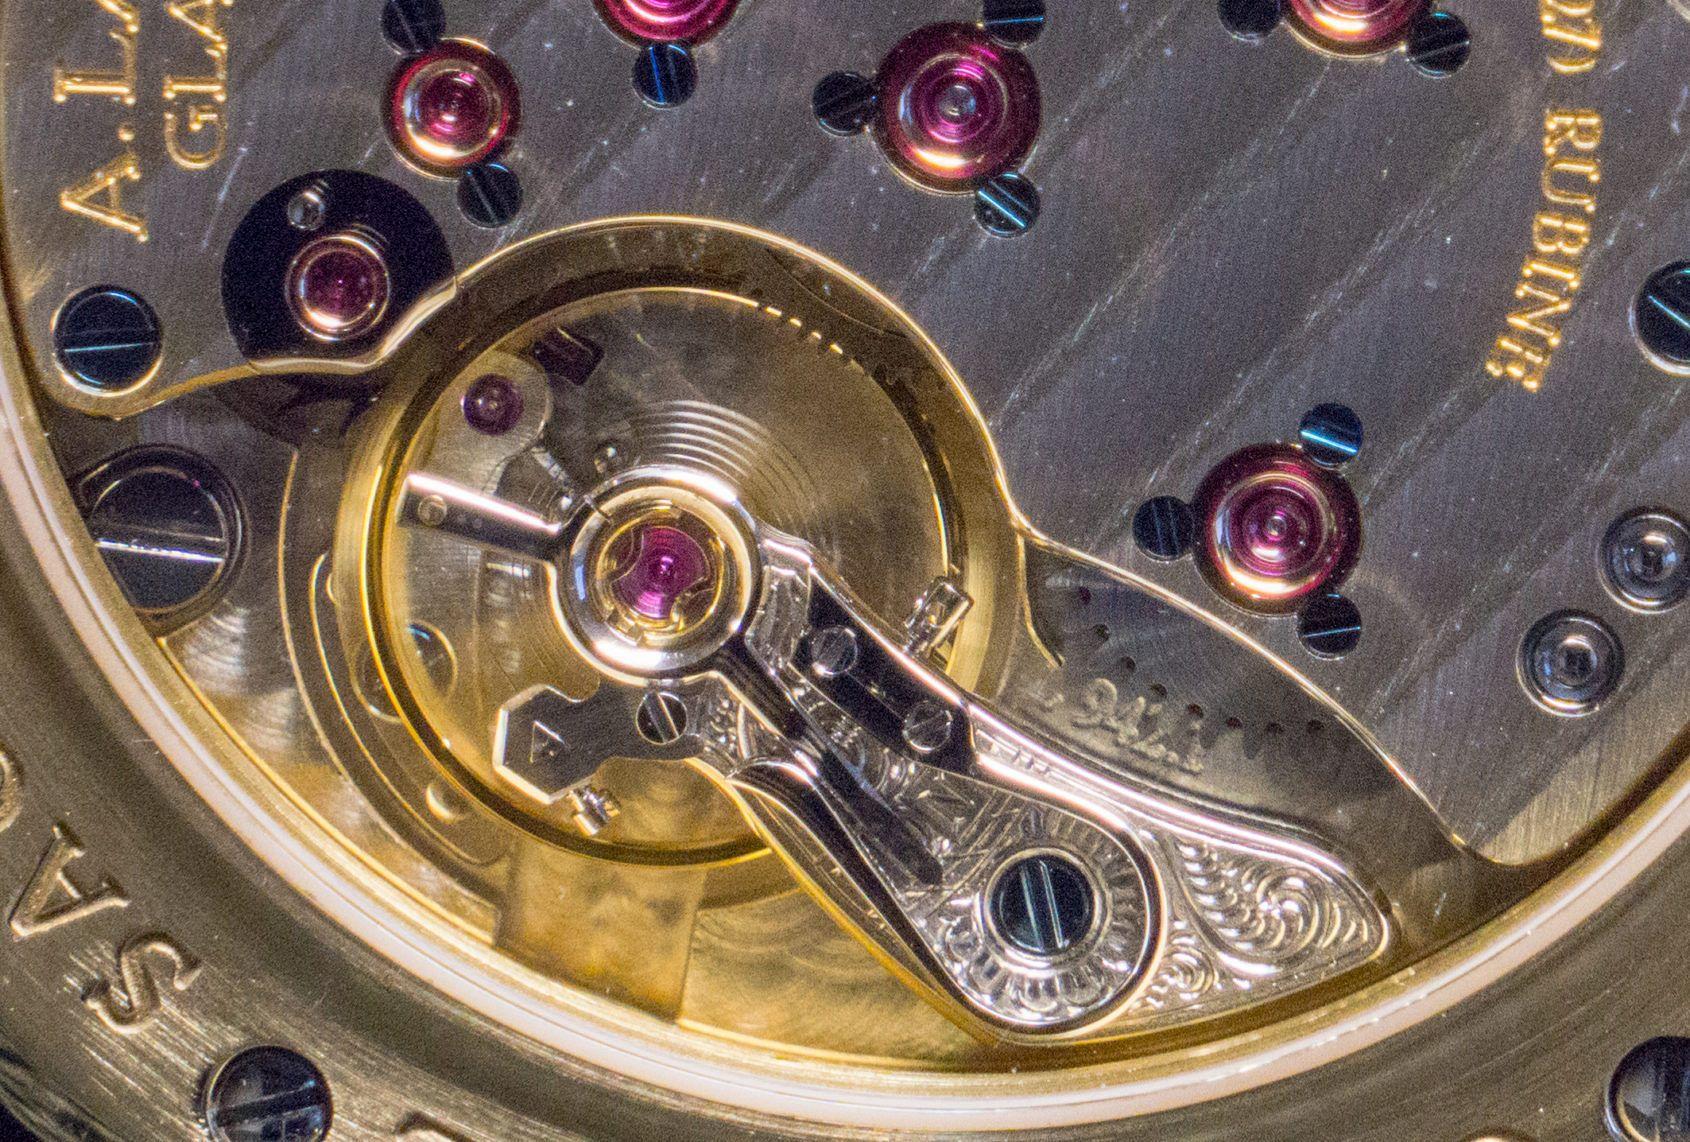 A. Lange & Söhne 1815 Up/Down 36mm